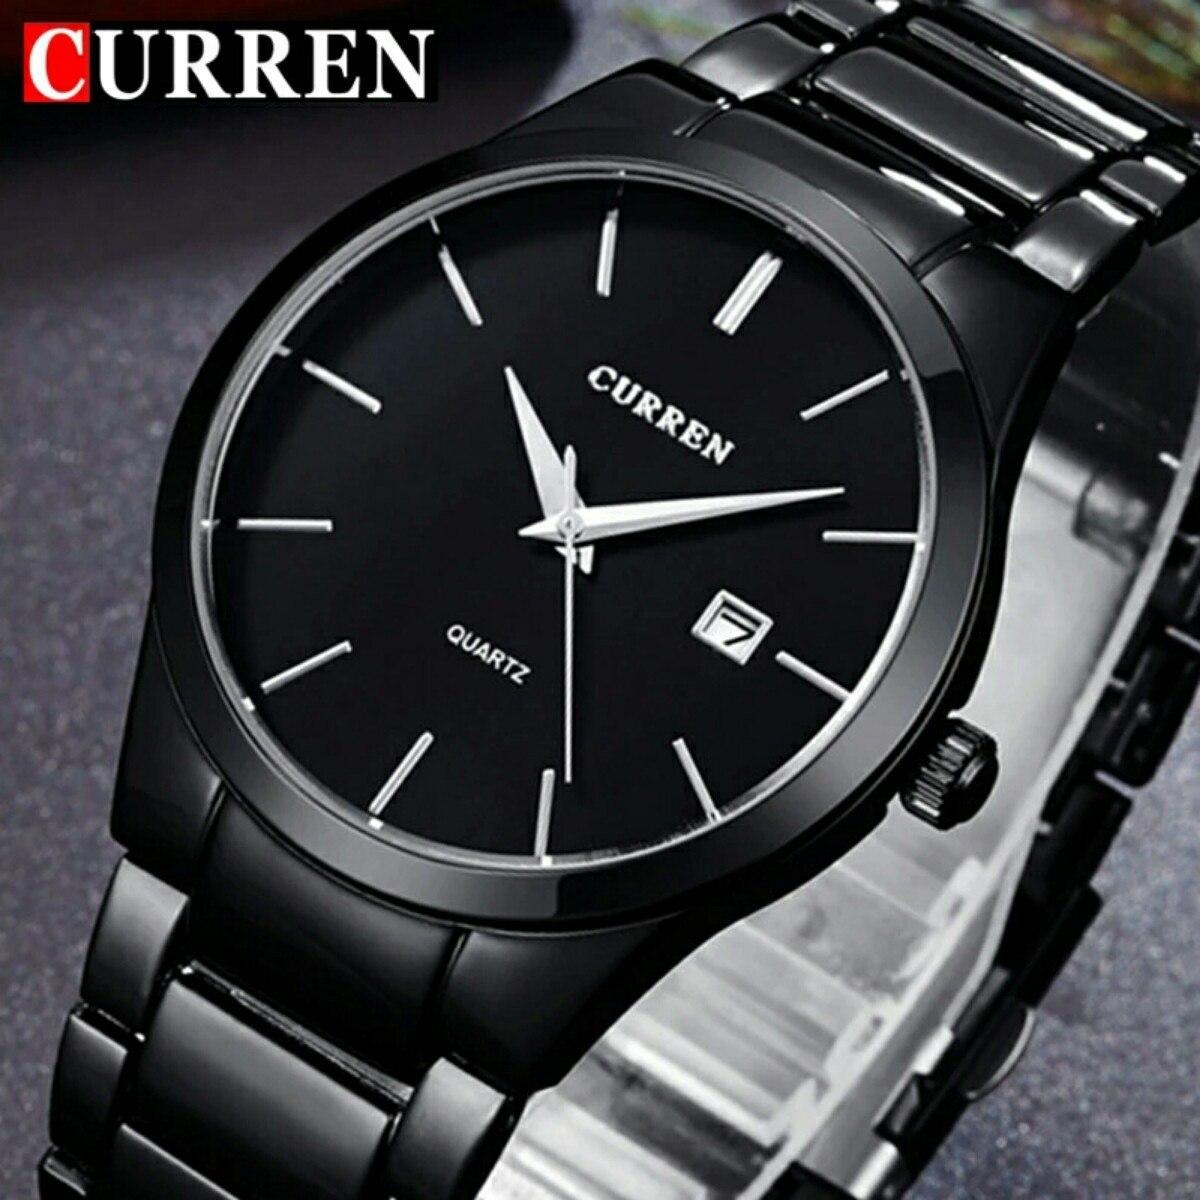 d89d3370b relógio pulso social masculino original da marca curren luxo. Carregando  zoom.